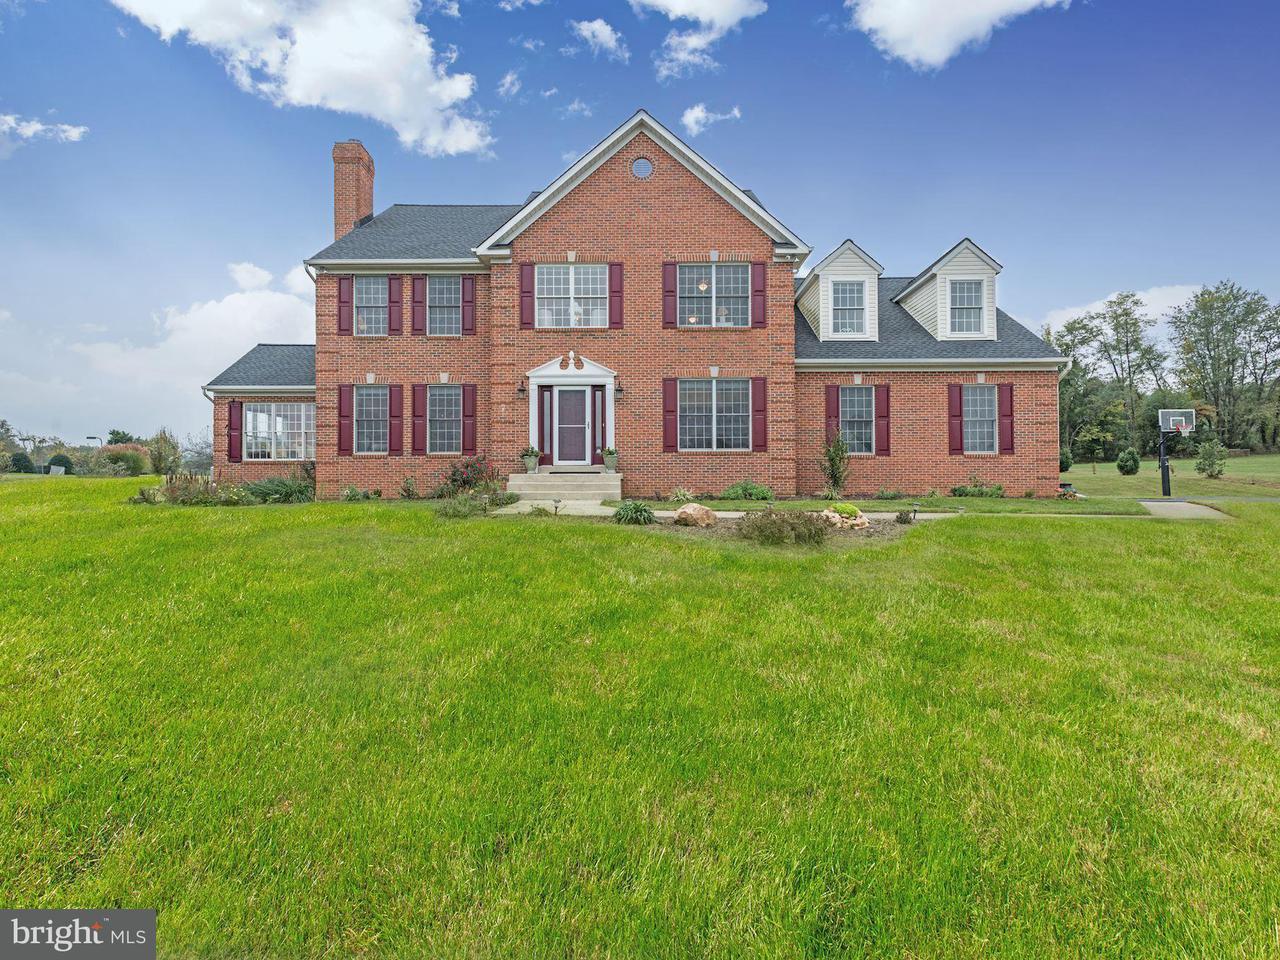 独户住宅 为 销售 在 3223 Roscommon Drive 3223 Roscommon Drive Glenelg, 马里兰州 21737 美国